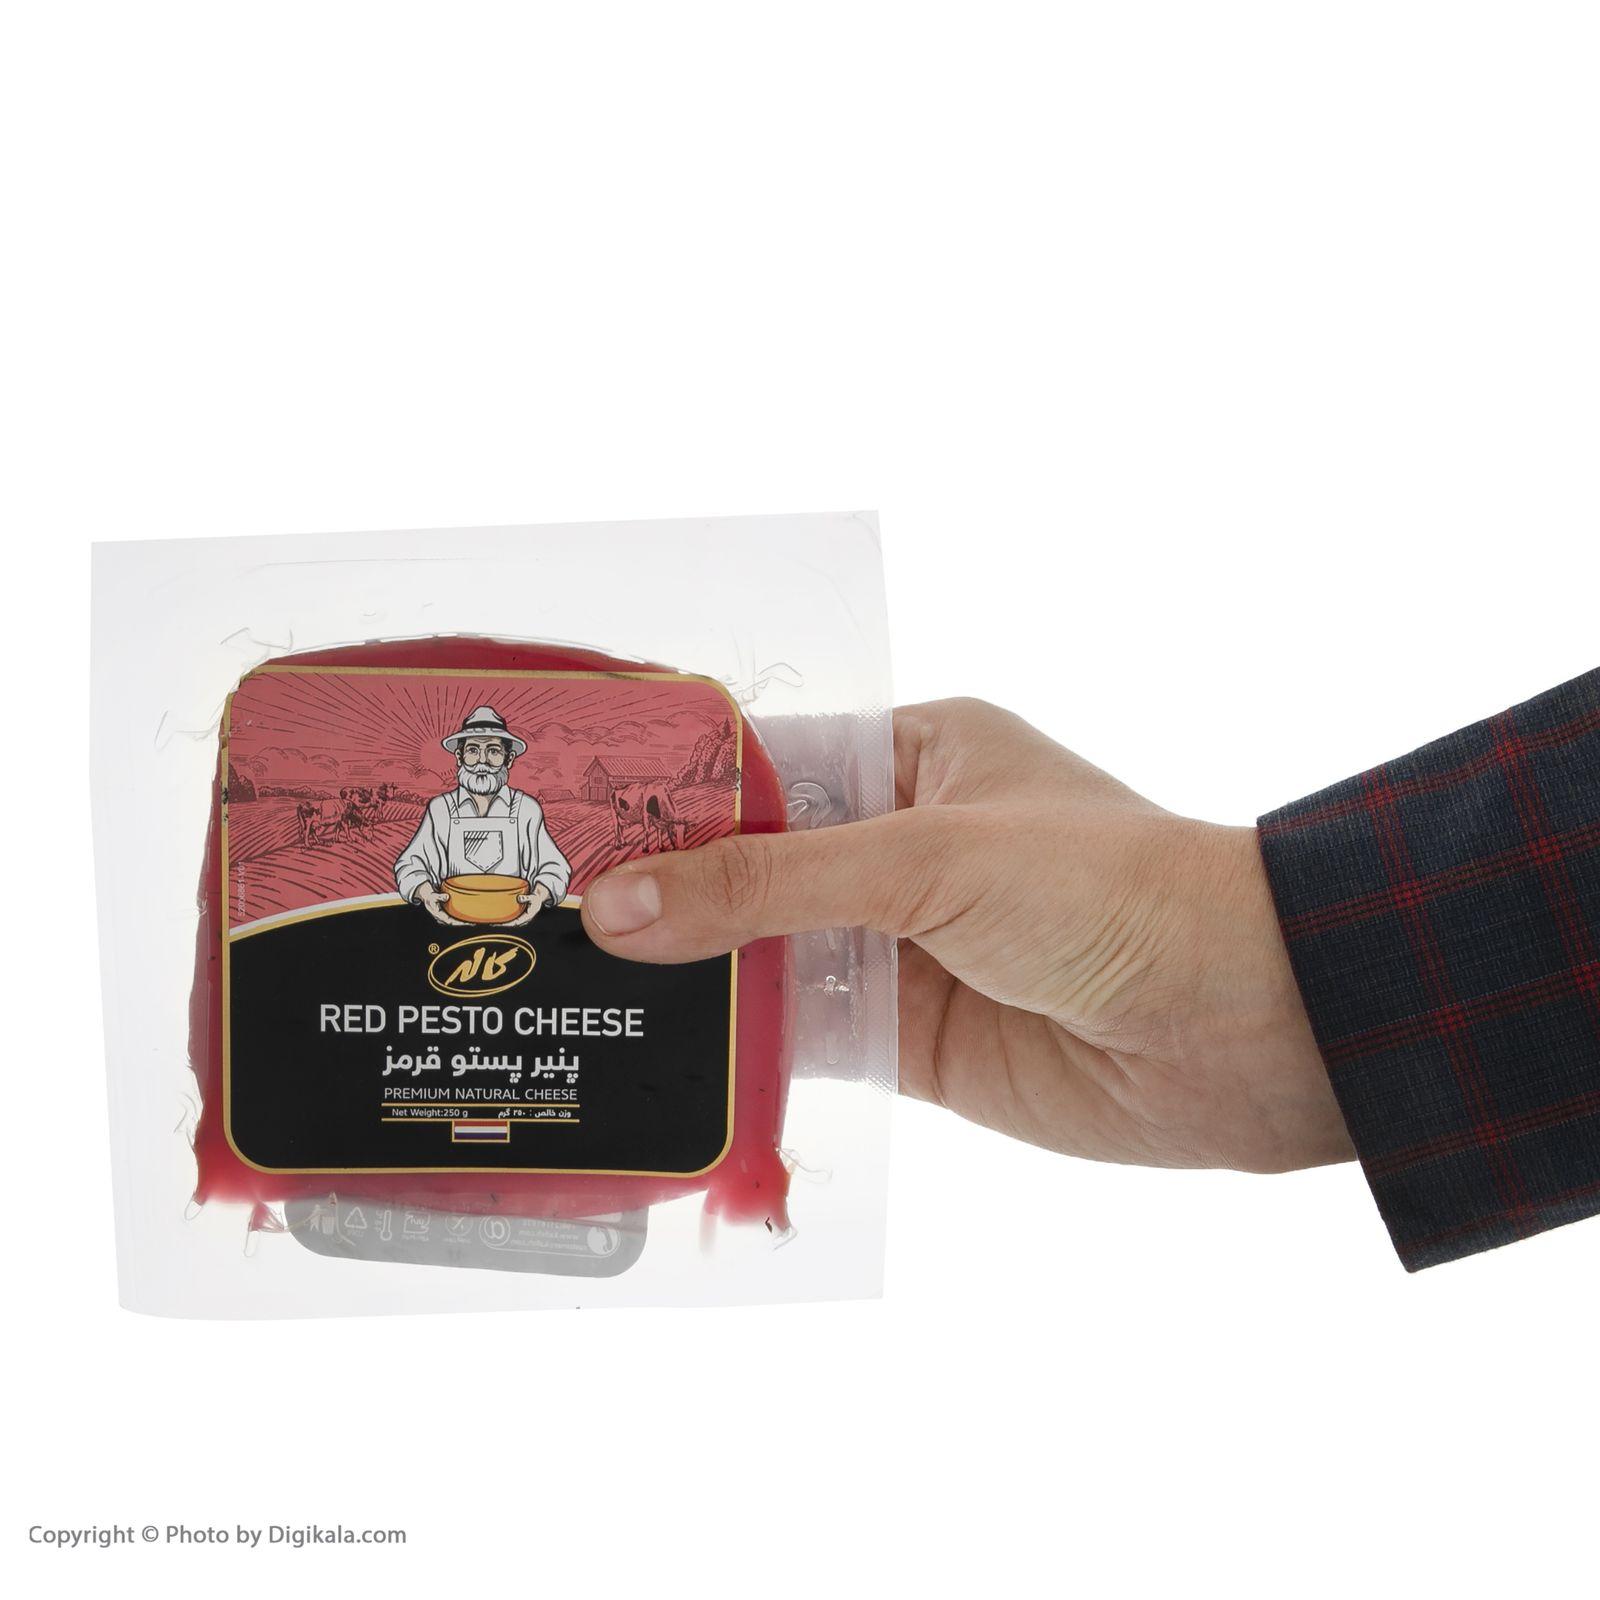 پنیر گودا پستو قرمز کاله مقدار 250 گرم main 1 1